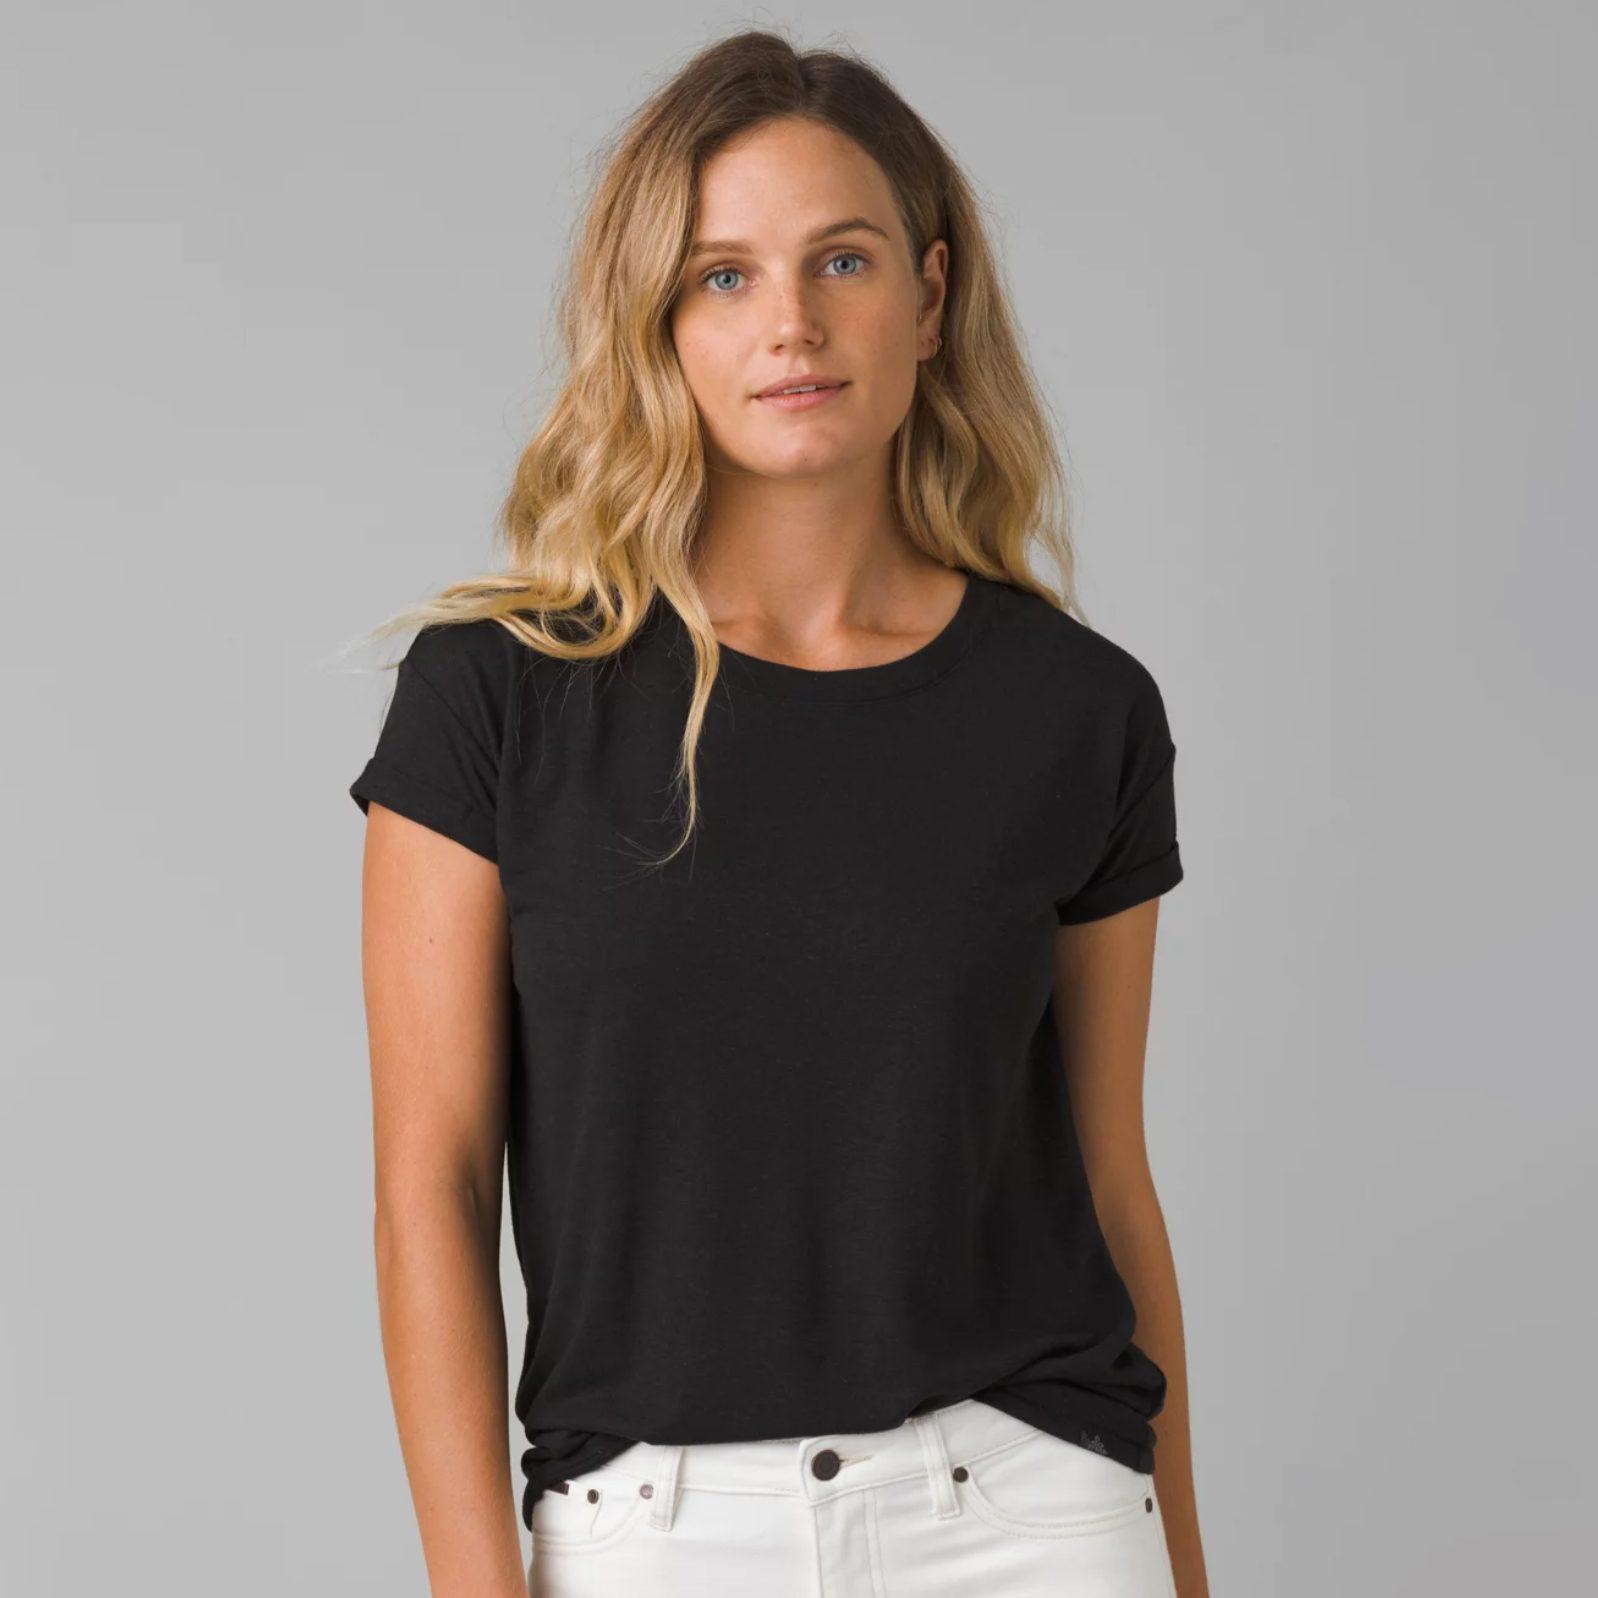 Cozy Up T-Shirt from prAna